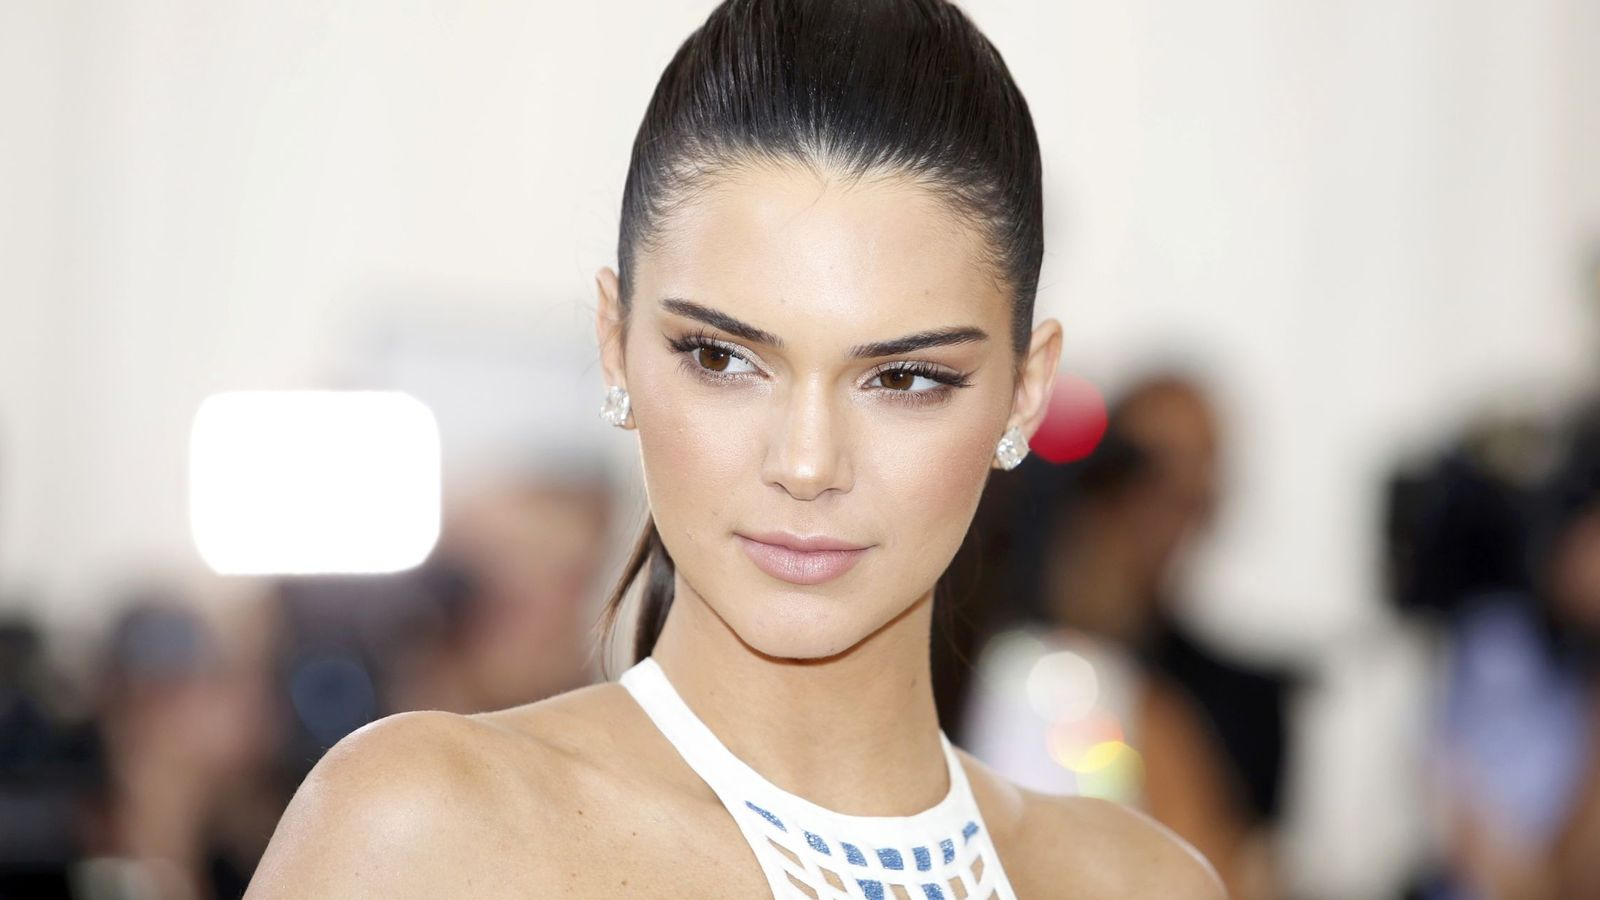 Foto: Kendall Jenner en una imagen de archivo. (Reuters)